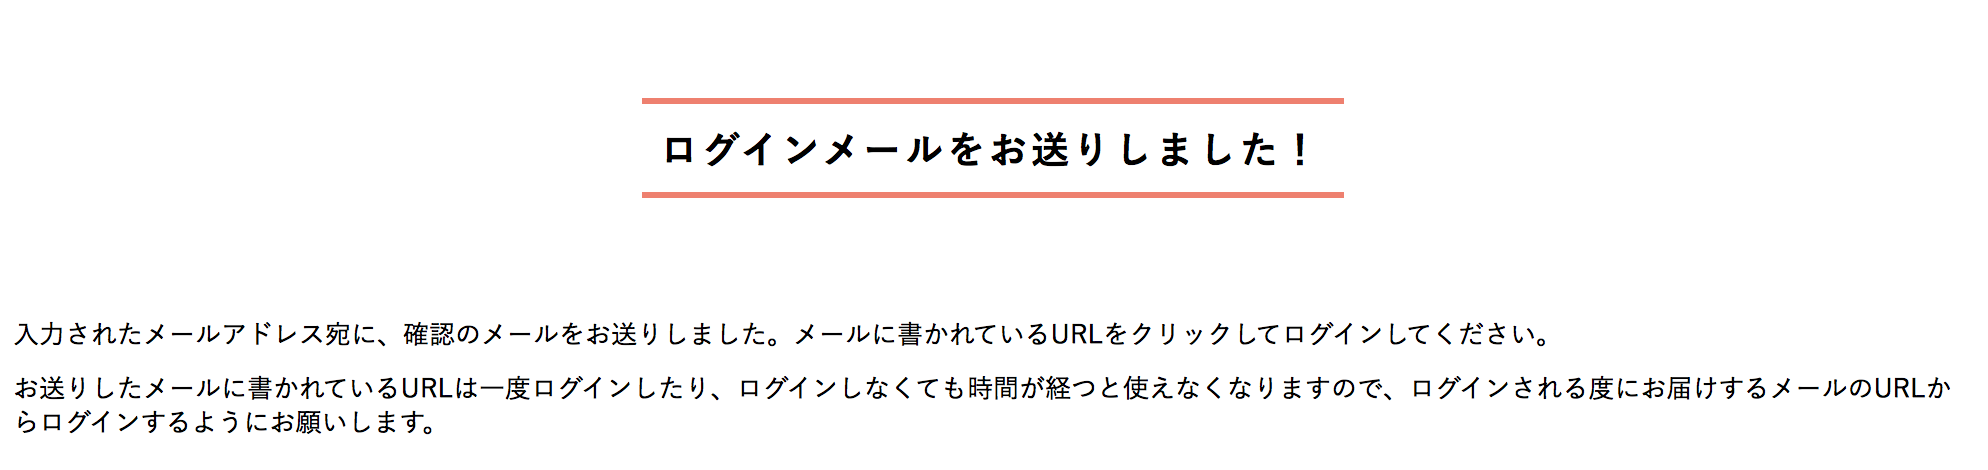 HappyFabricログインメール送付通知画面